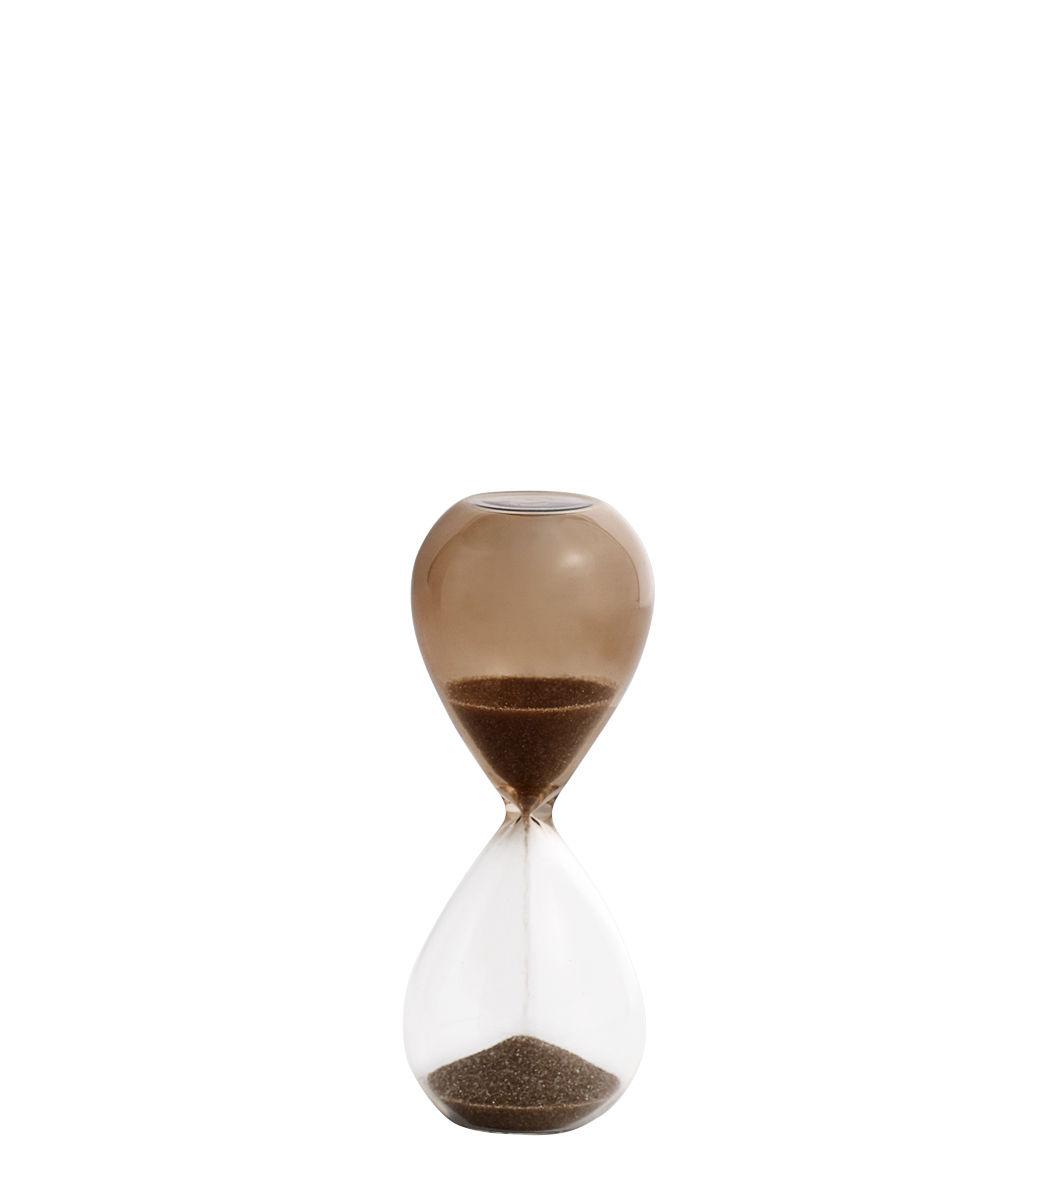 Cucina - Utensili da cucina - Clessidra Time Small - / 3 Minuti - H 9 cm di Hay - Trasparente / Nude - sable, Vetro